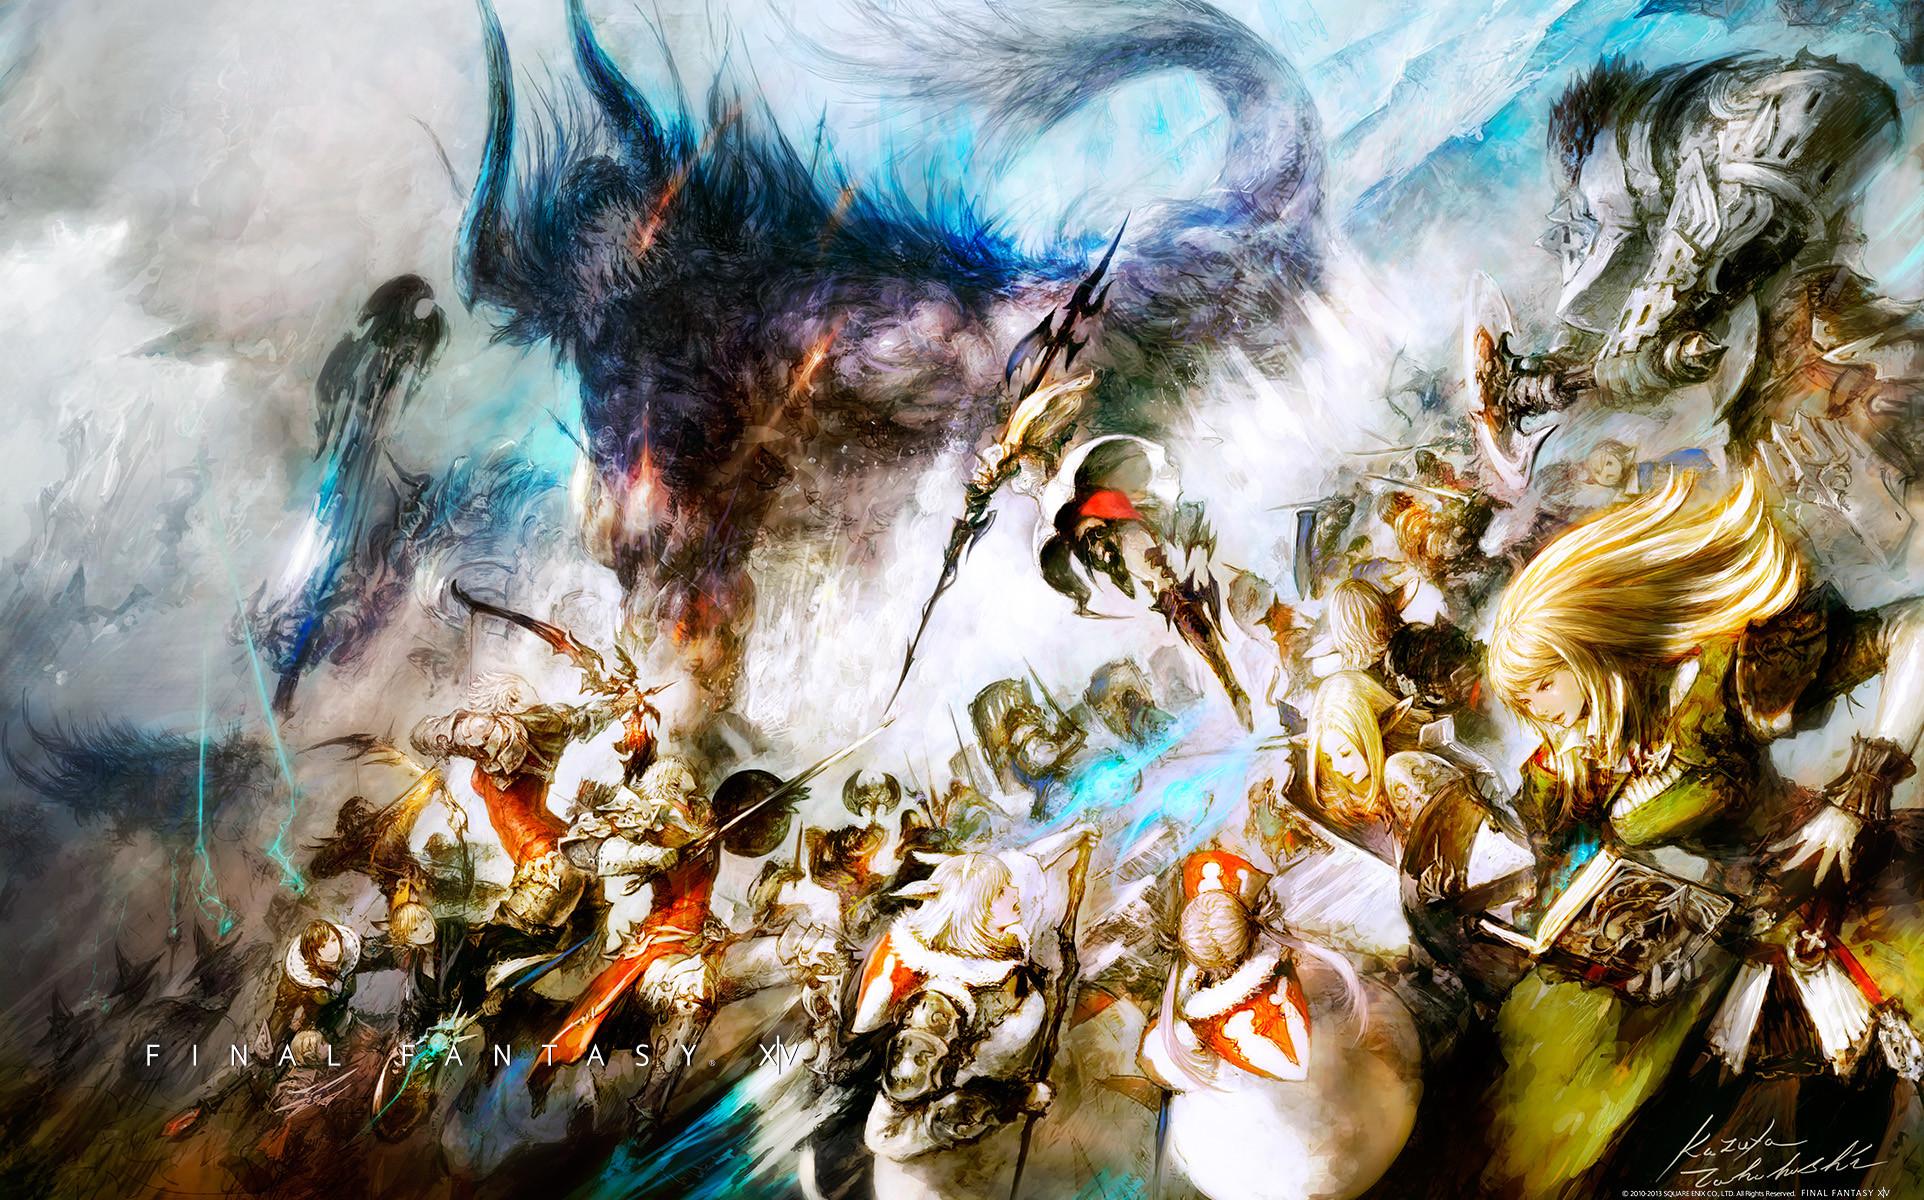 Res: 1924x1200, Final Fantasy XV Wallpaper